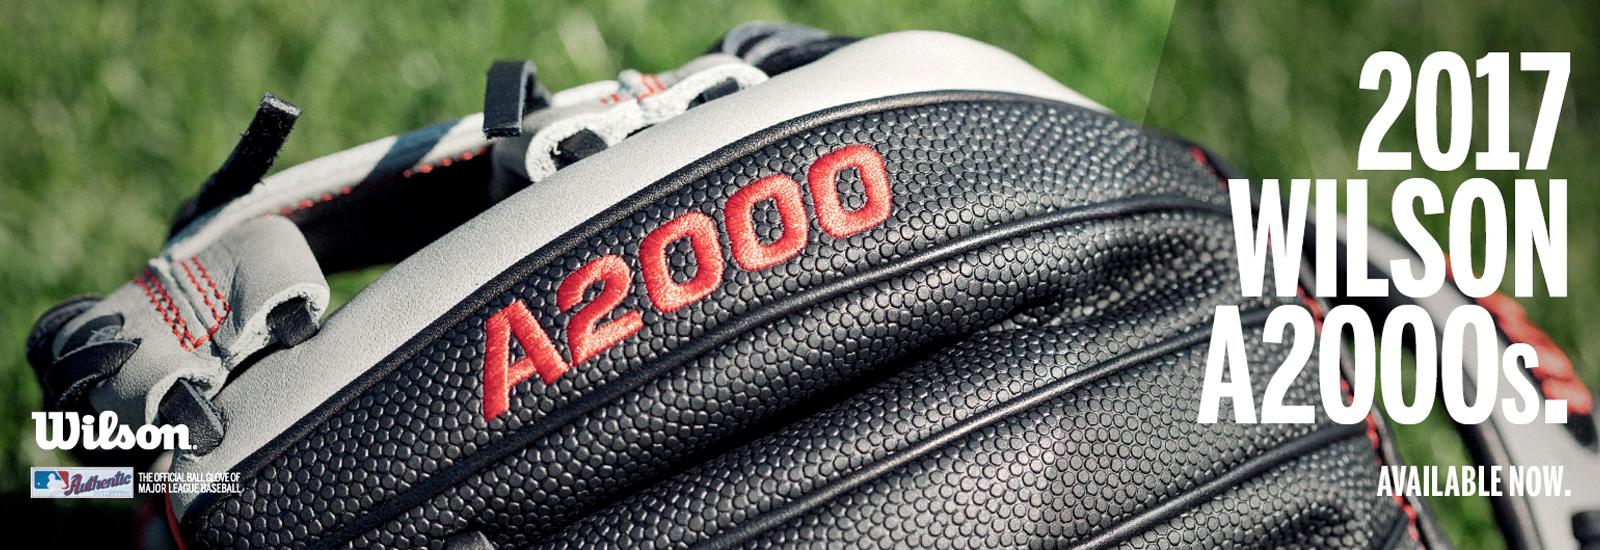 Wilson A2000 Gloves